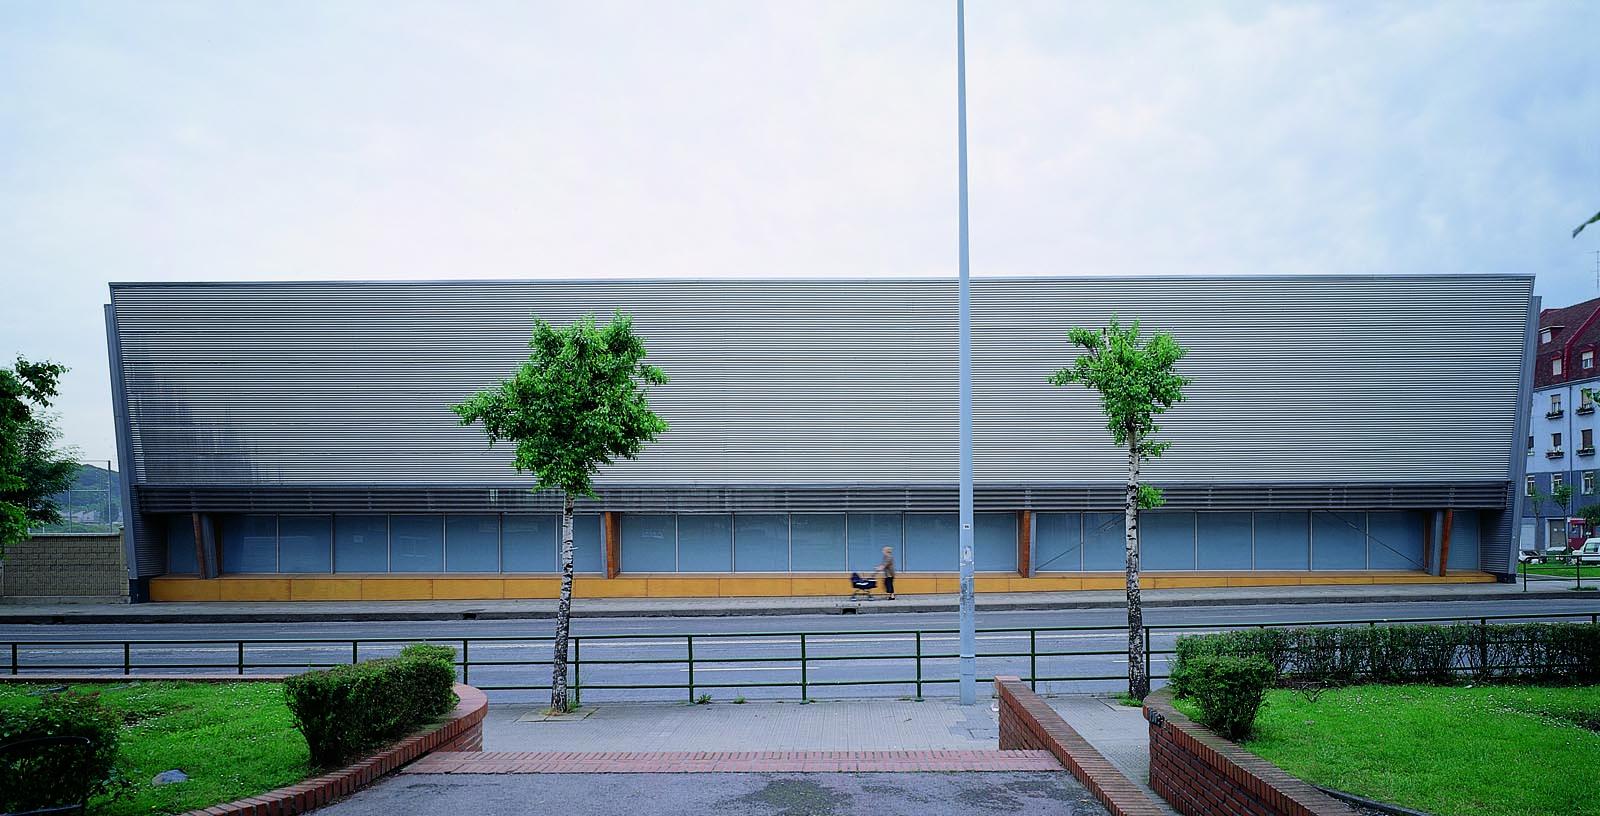 Zorroza_Sports_Centre_Architecture_02_IDOM_copyright_Javier_Aja